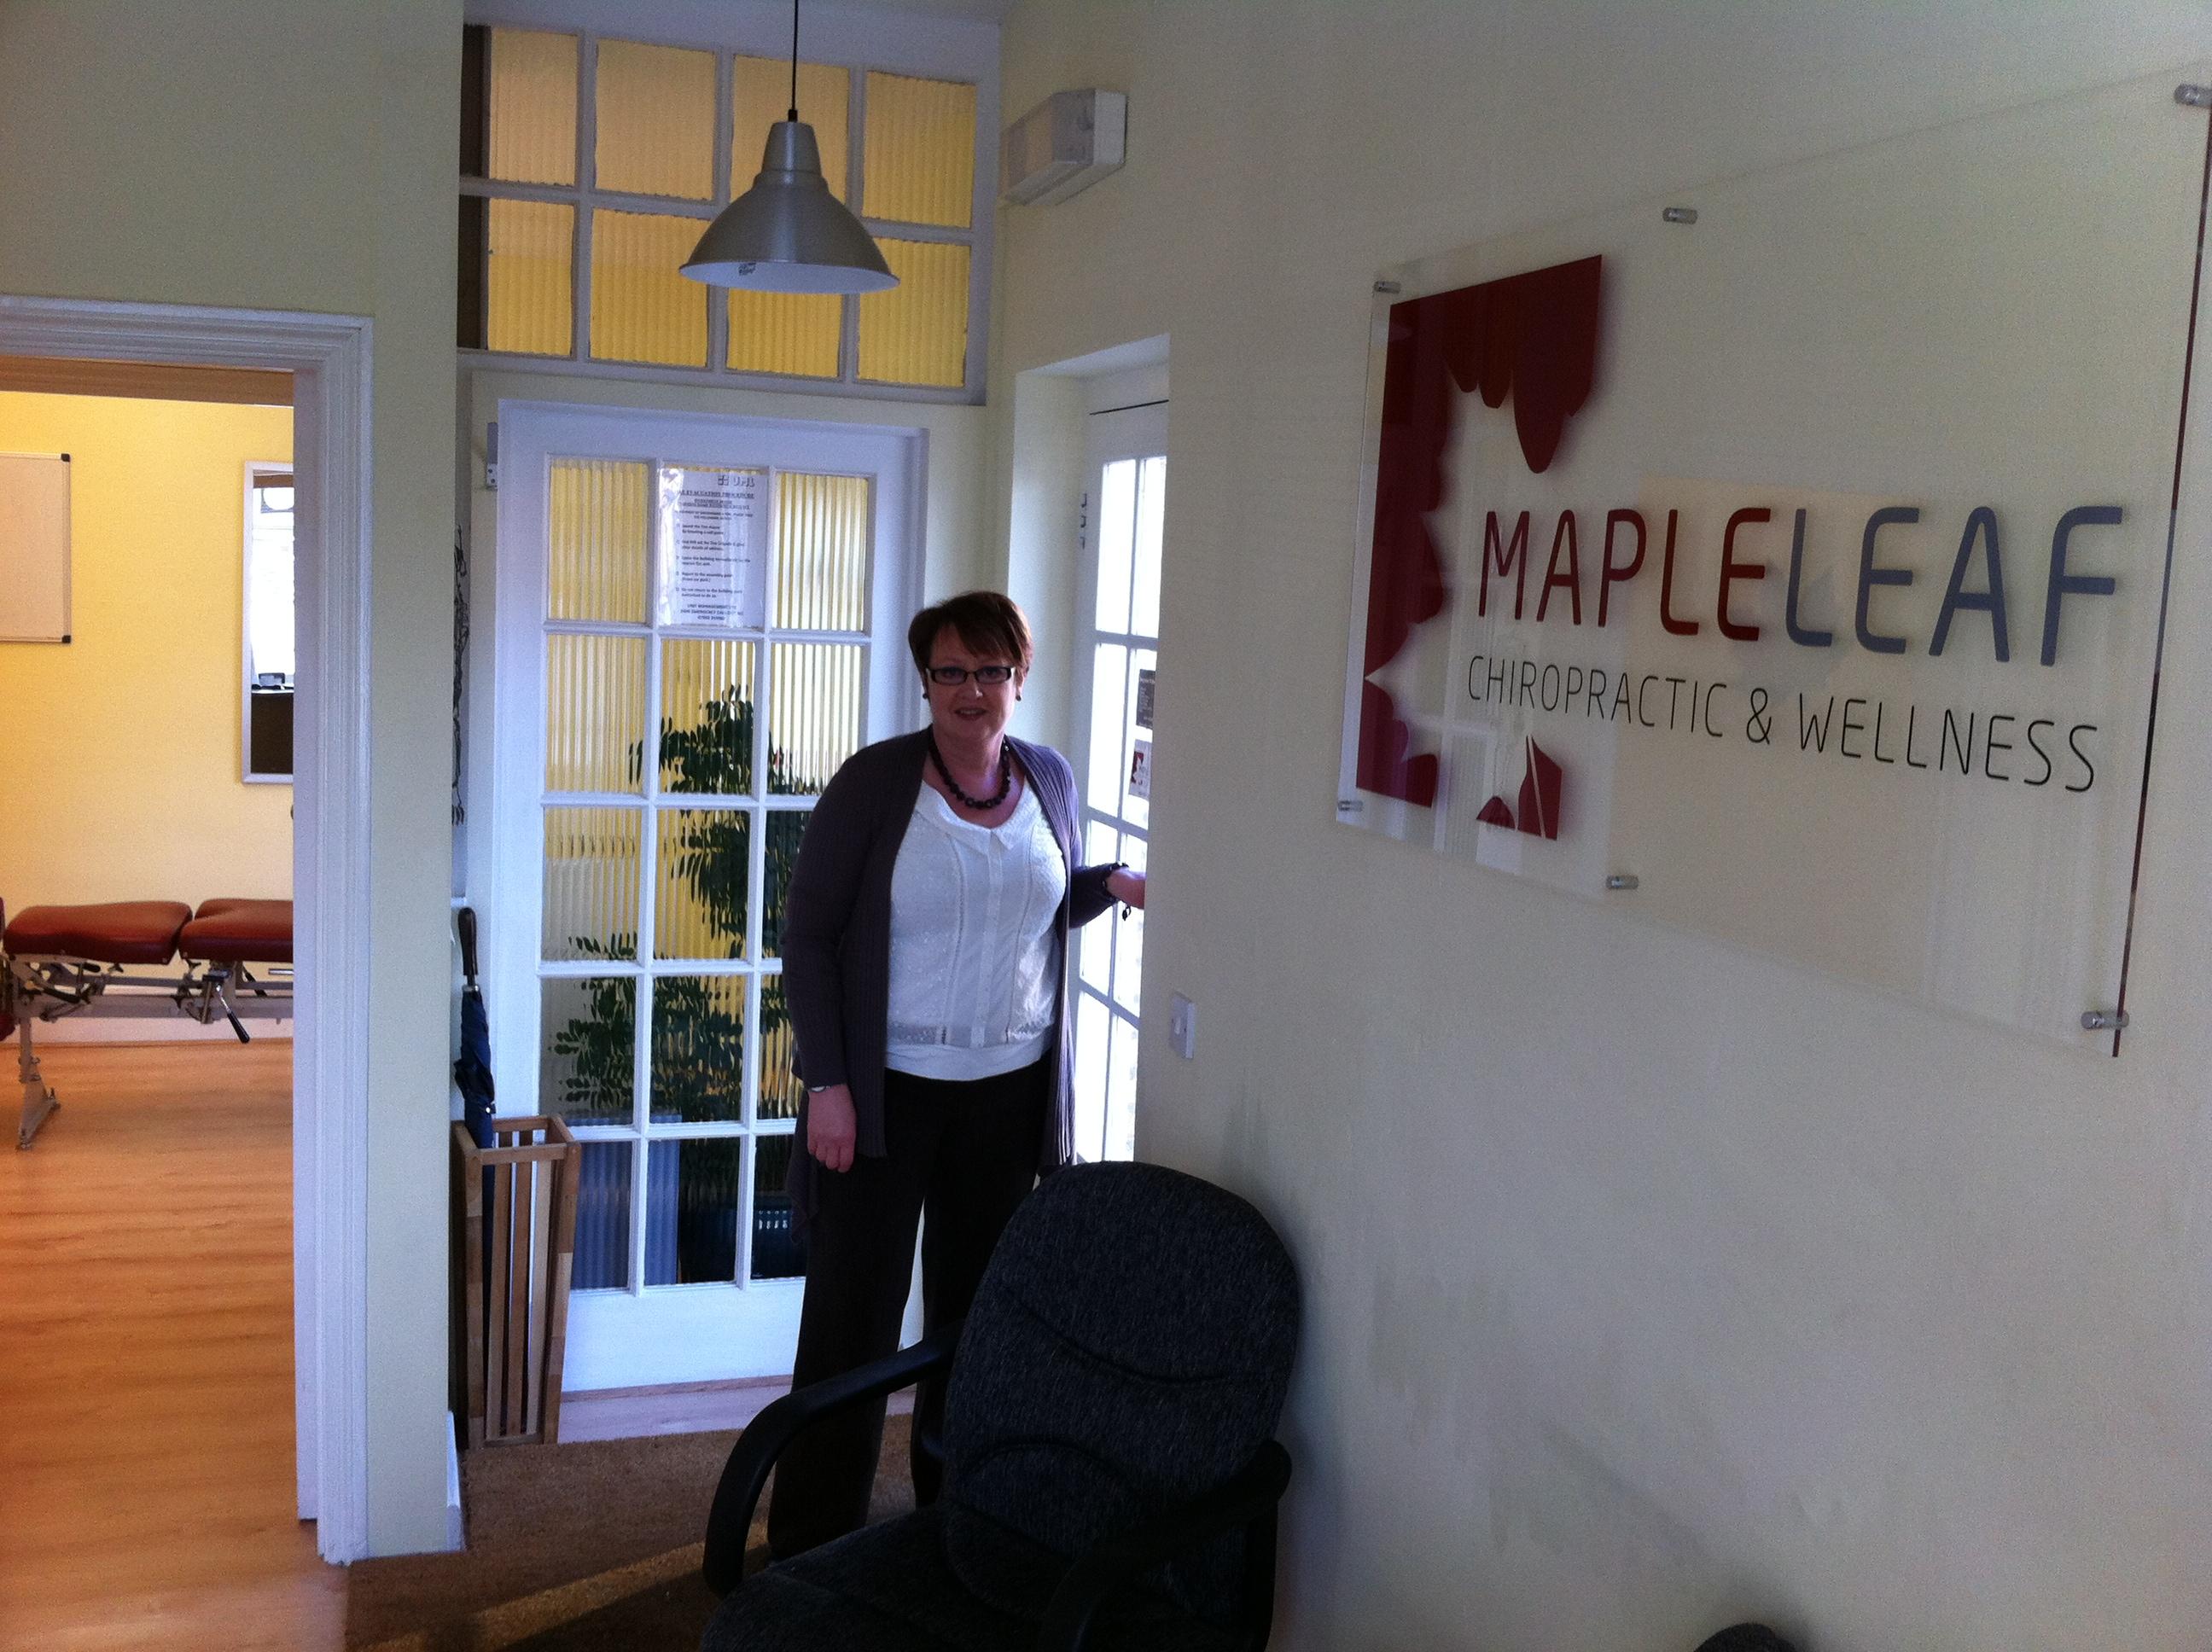 Maple Leaf Chiropractor and Wellness Centre Weybridge Surrey